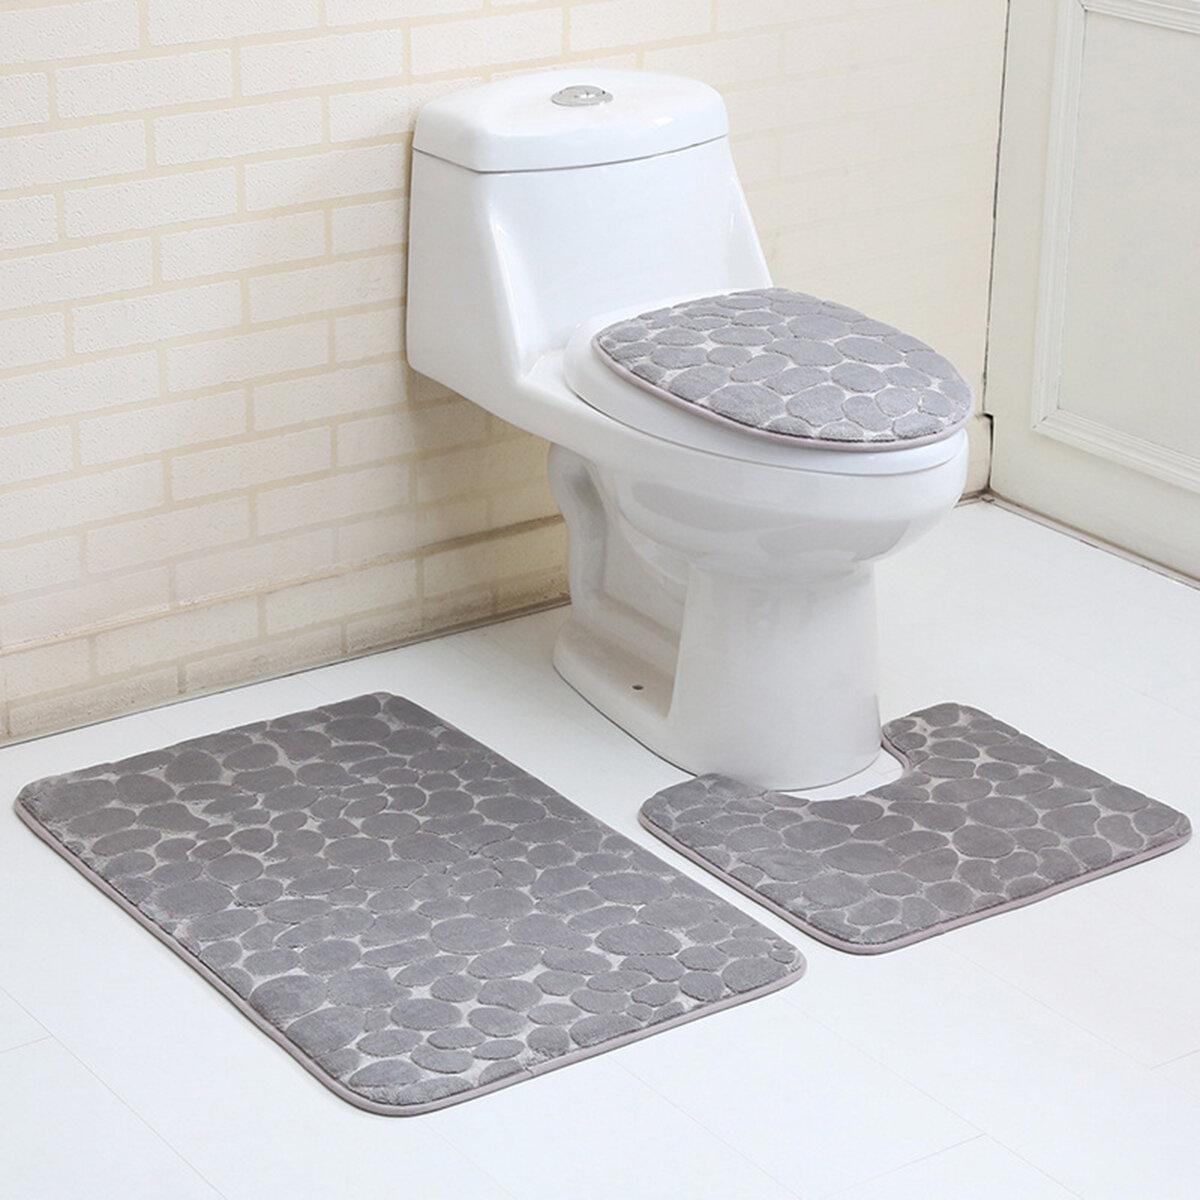 3PCS Toilet Seat Covers Bathroom Carpet Non-Slip Pedestal Rug + Lid Toilet  Cover + Bath Mat Set